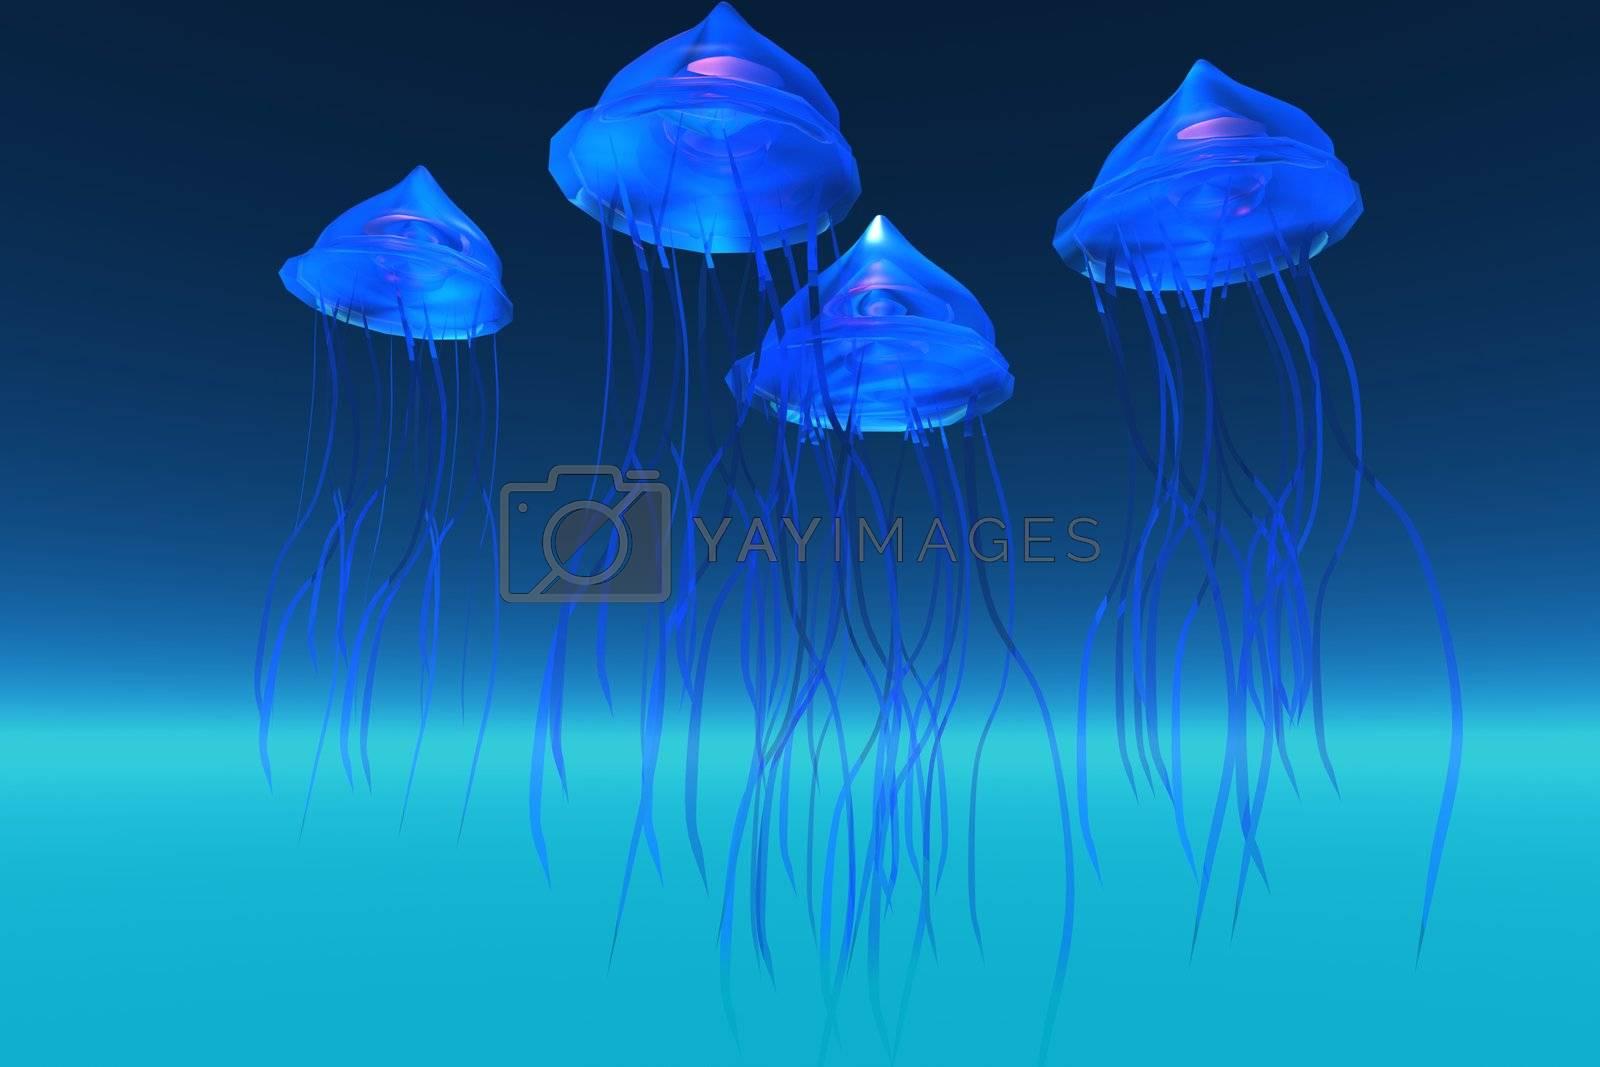 Iridescent glowing blue jeelyfish swim in the ocean.